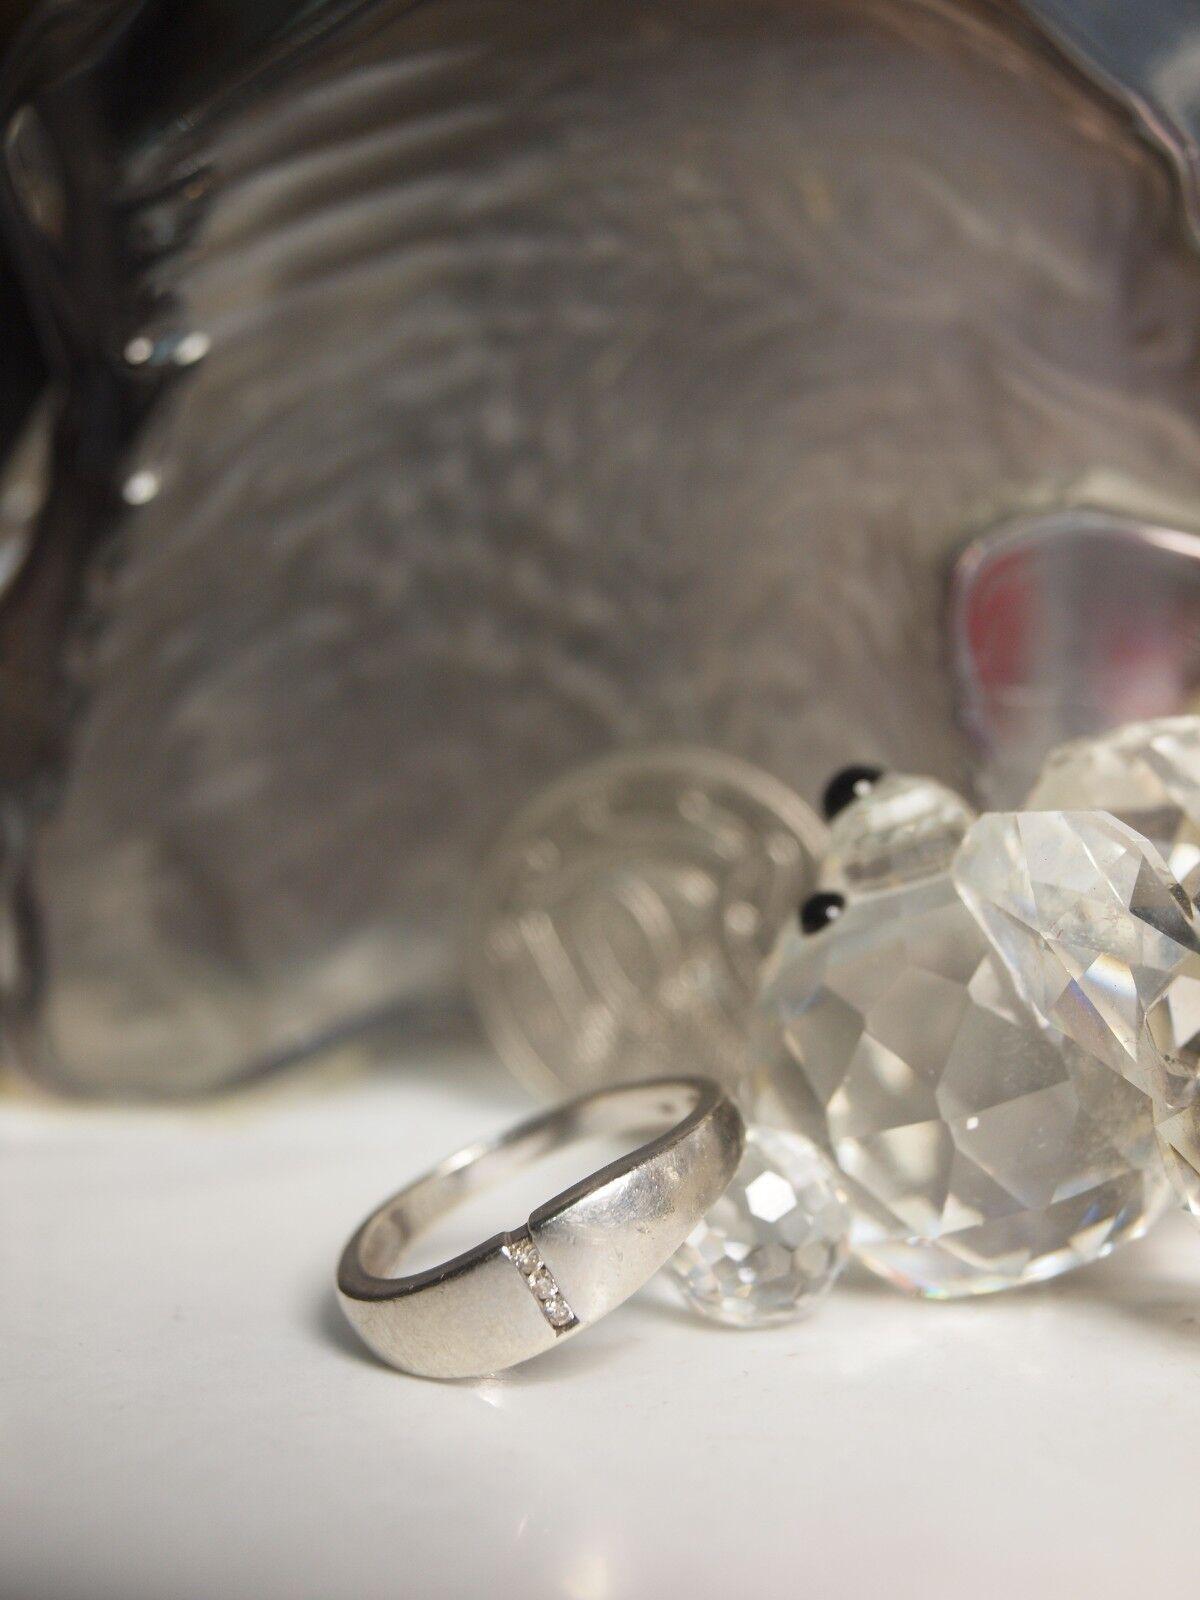 GENUINE 375 SOLID WHITE gold LADIES DIAMOND RING - SIZE   O   HALLMARKED   375